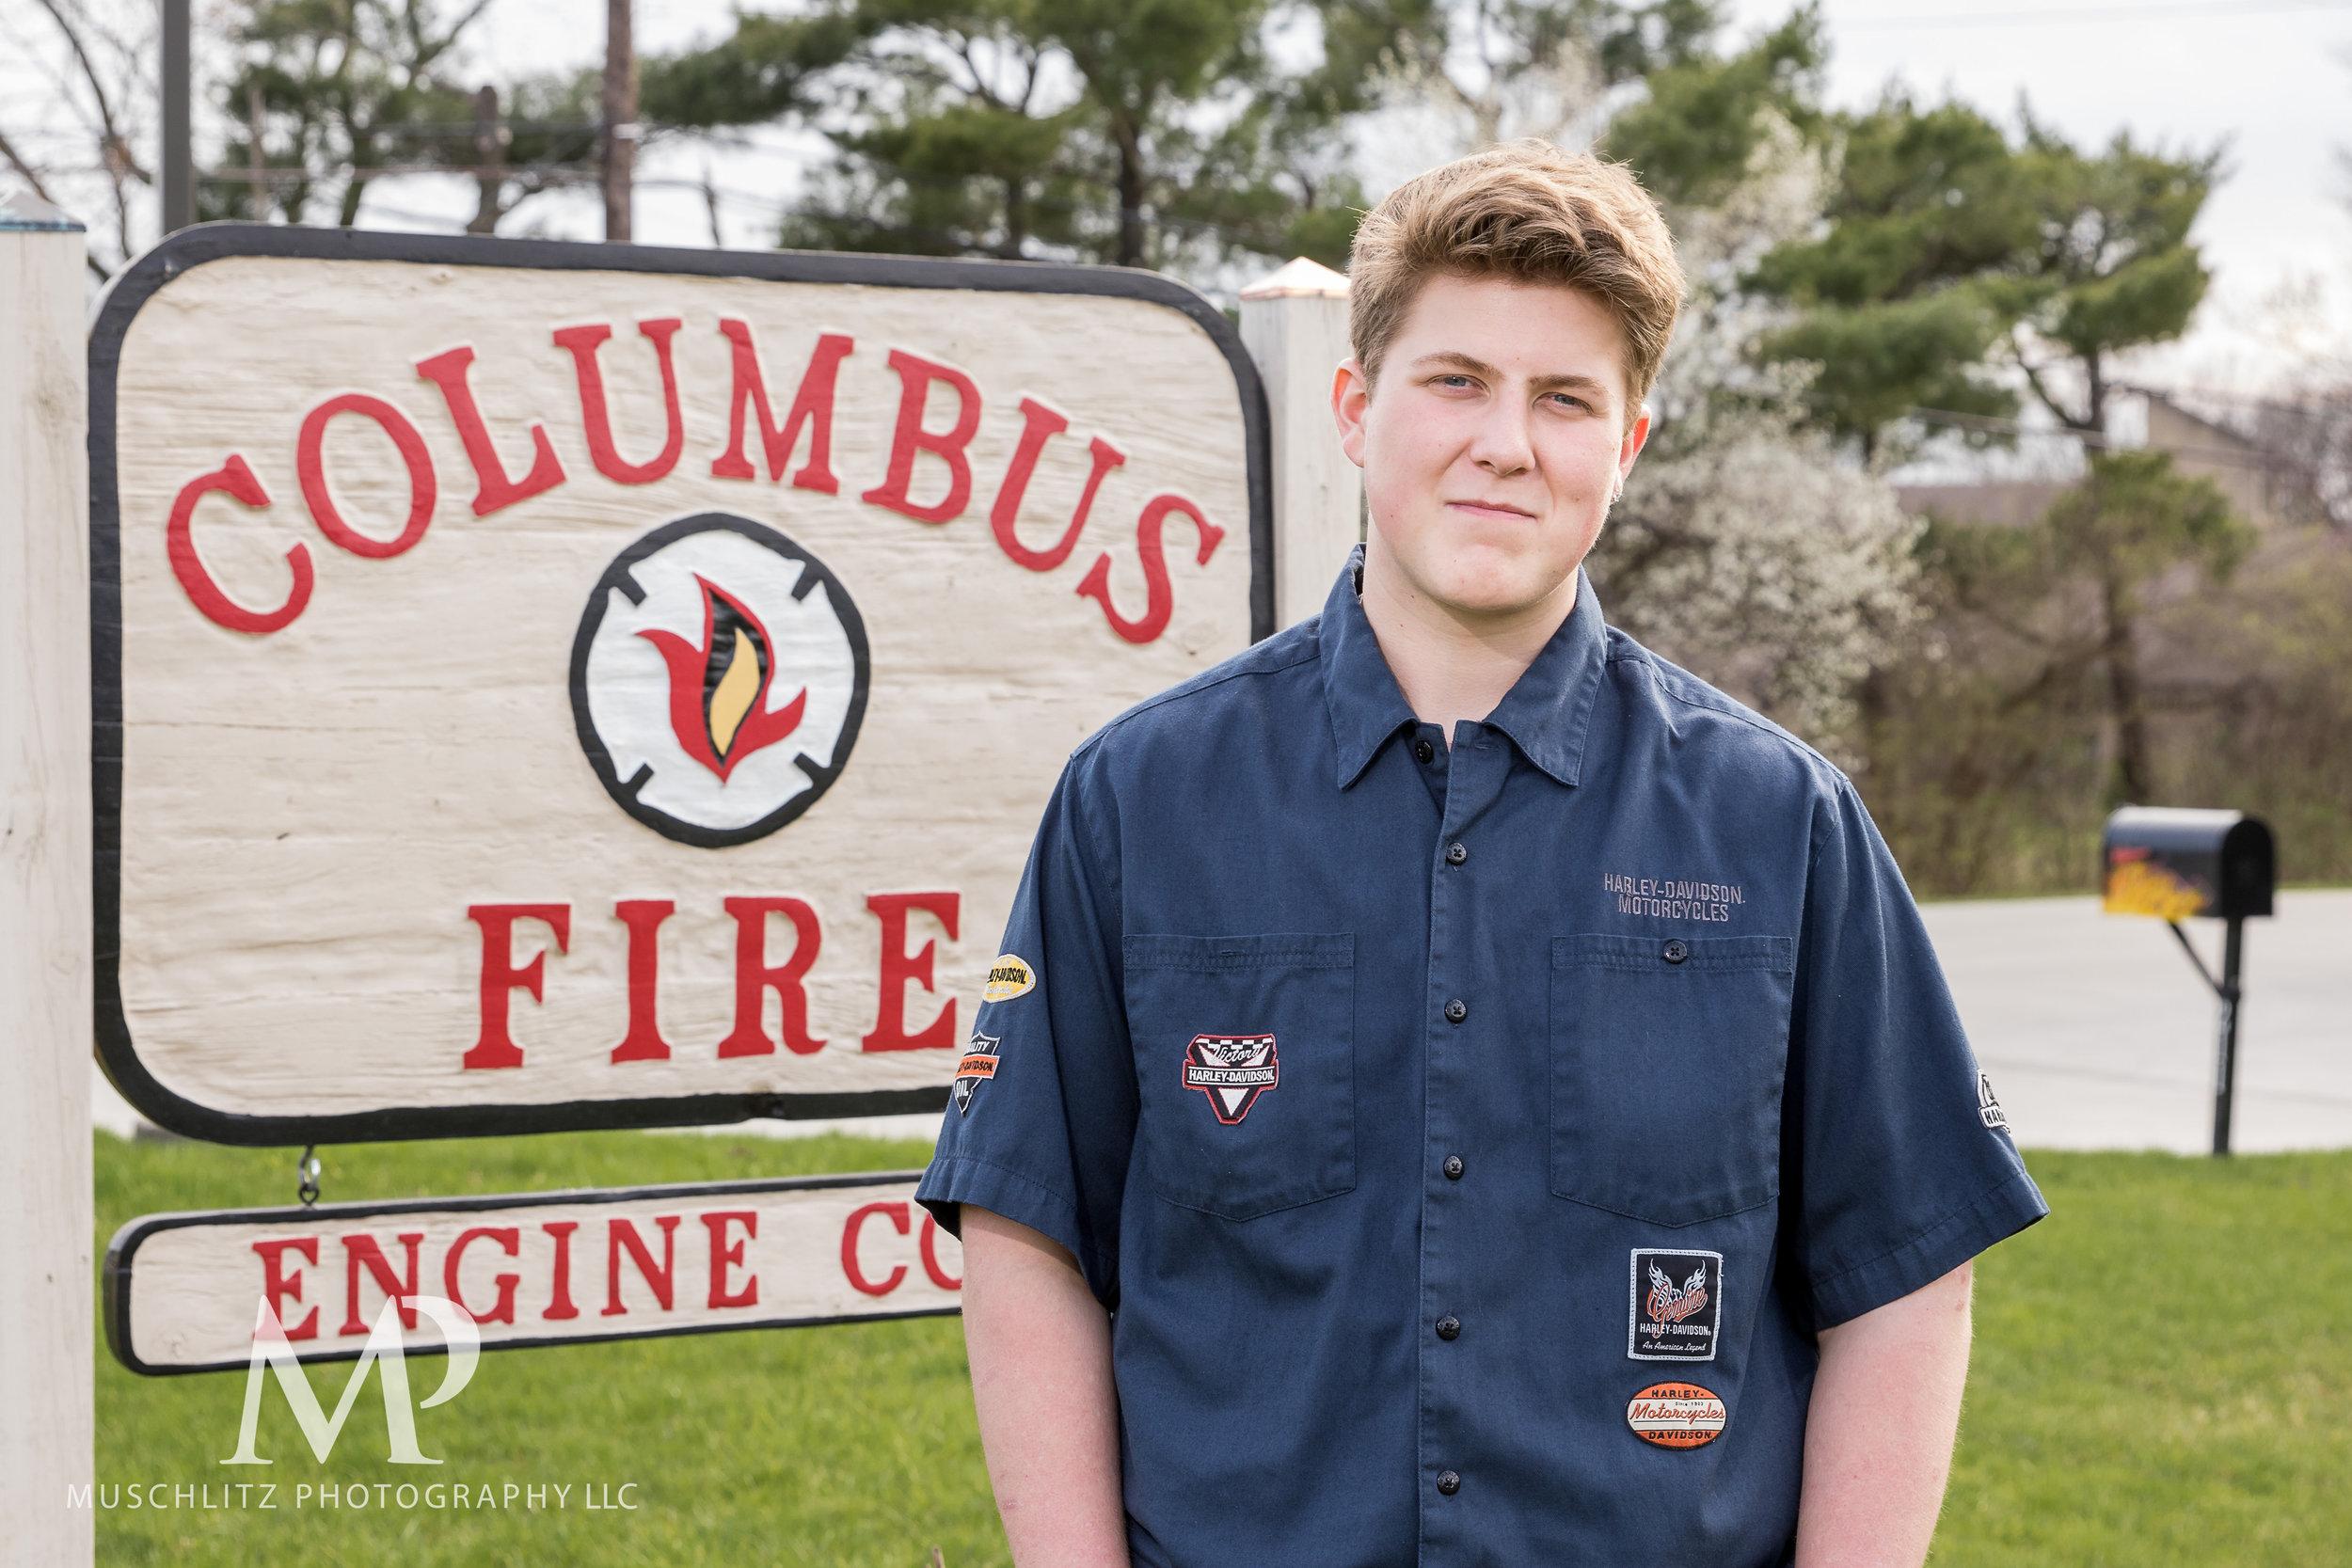 senior-portrait-fire-station-fireman-gahanna-columbus-photographer-studio-019.JPG